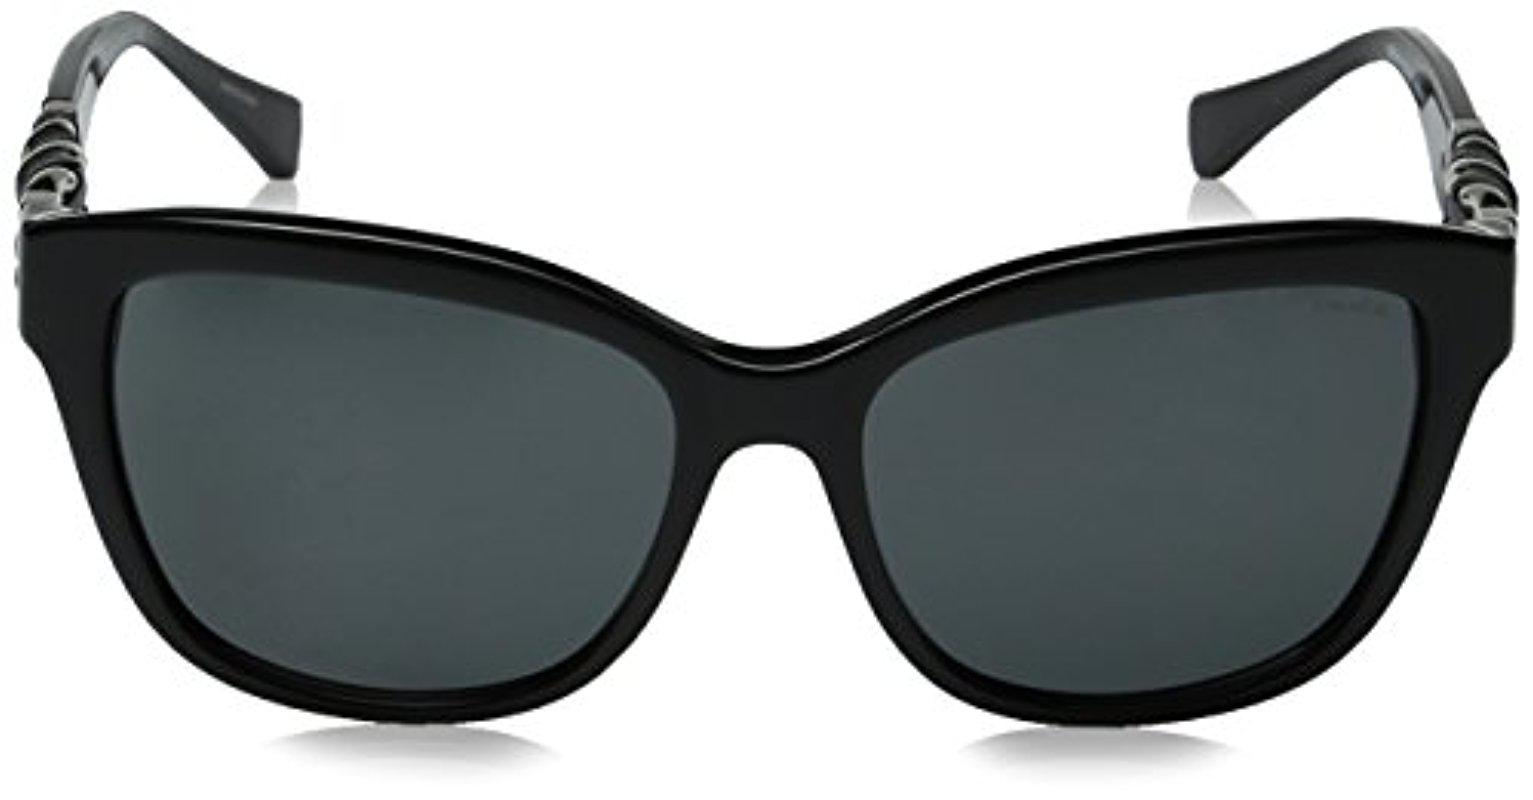 002c732b3878 COACH Hc8156q L131 Sunglasses 56mm in Black - Lyst